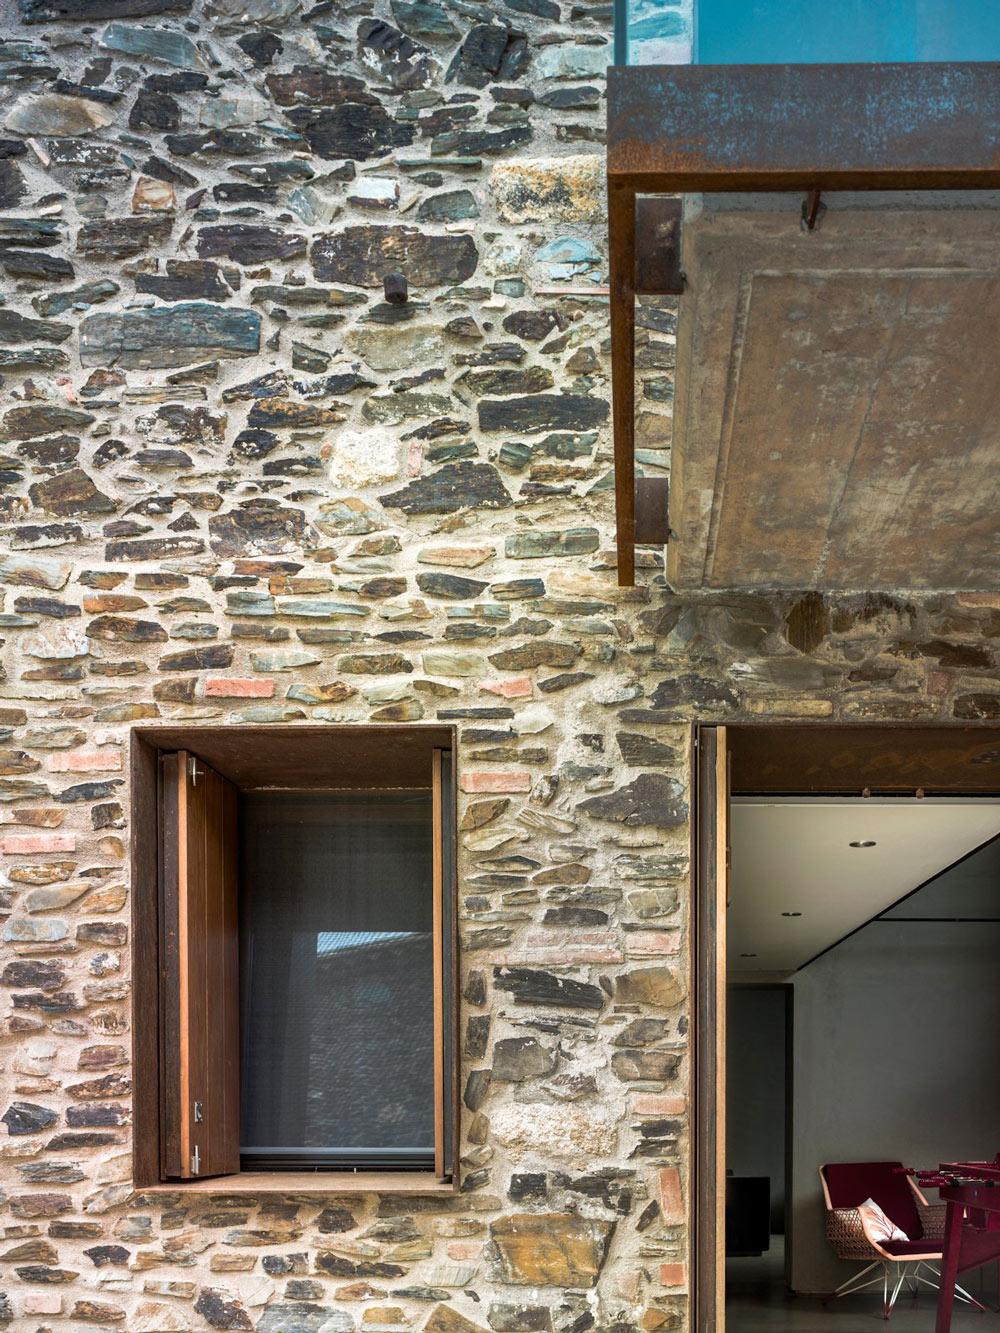 Natural Stone Walls, Catalan Farmhouse, Girona, Spain